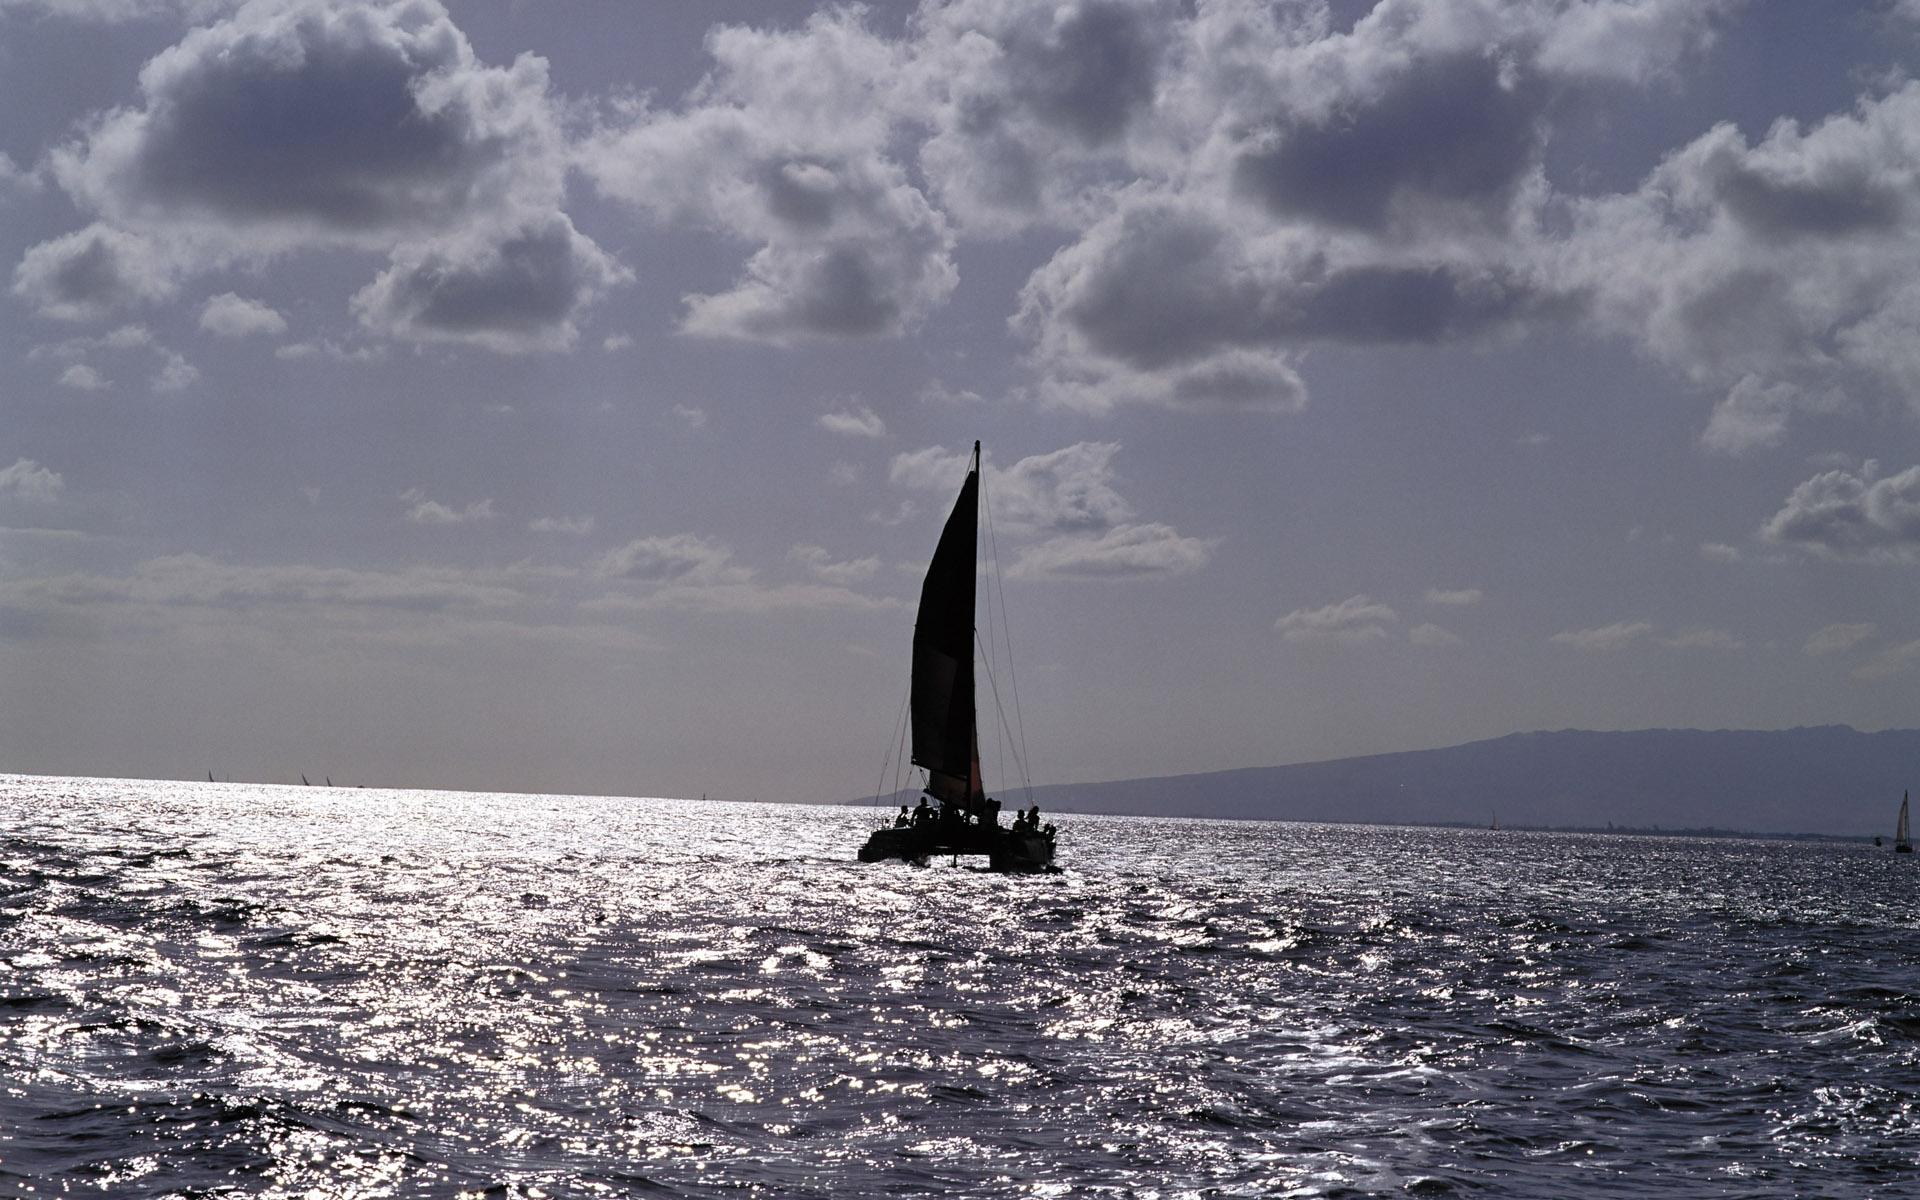 Zastaki.com - Sailing boat